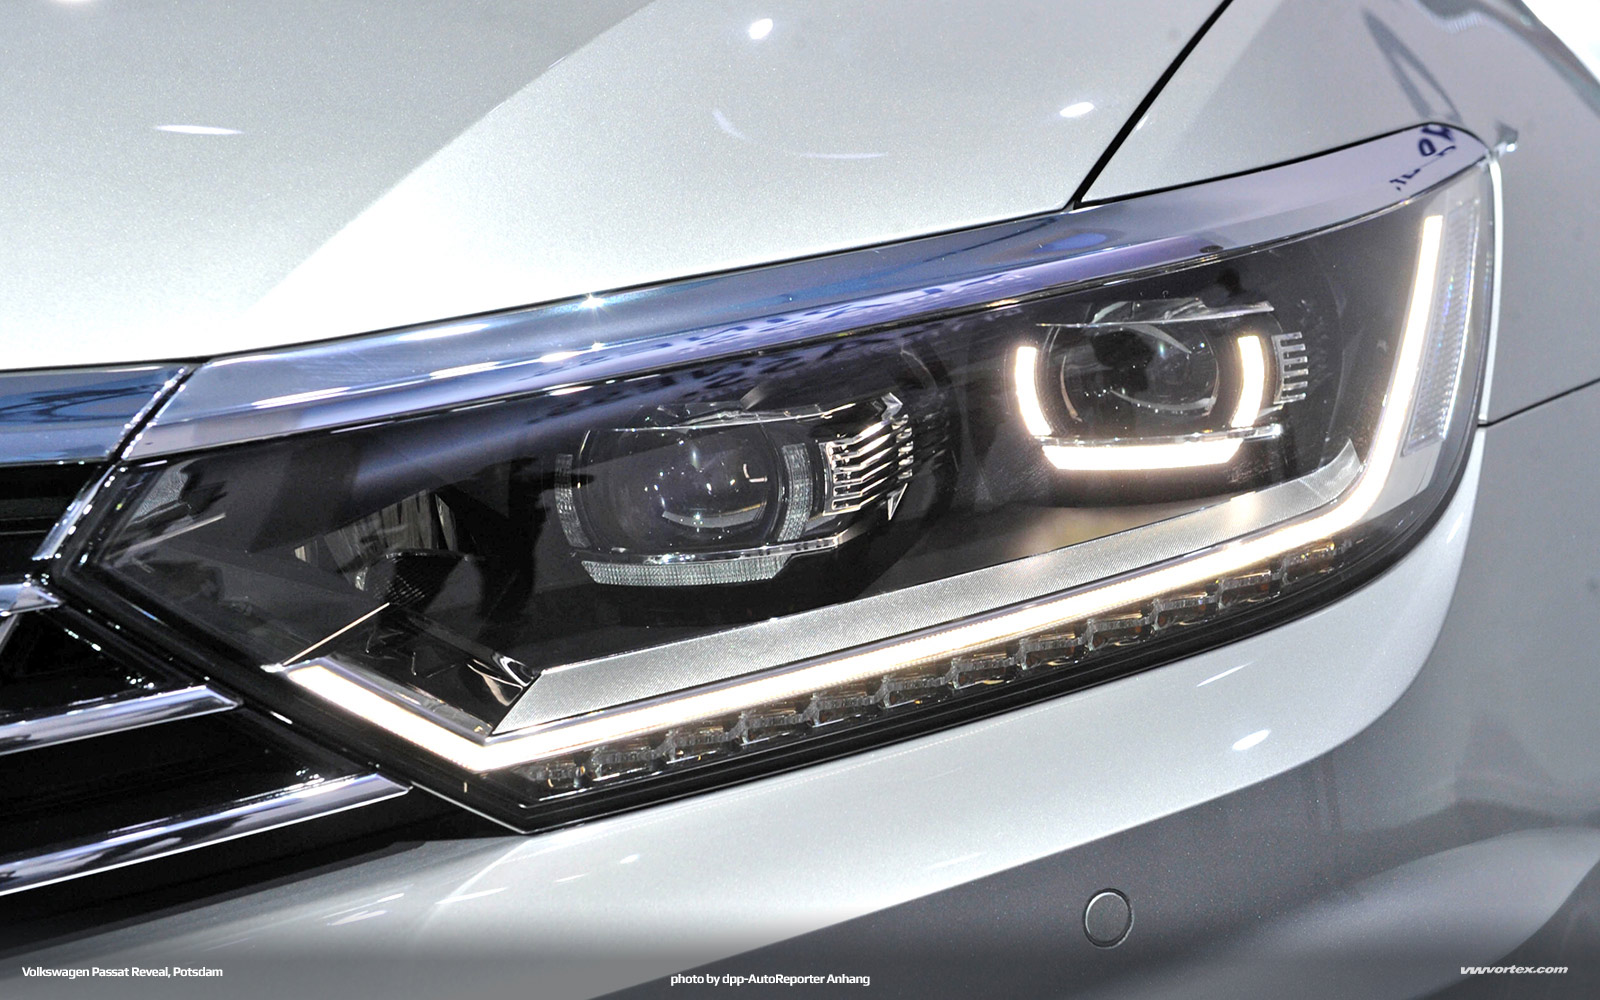 2014 Volkswagen Passat VIII MQB Reveal Potsdam 654 110x60